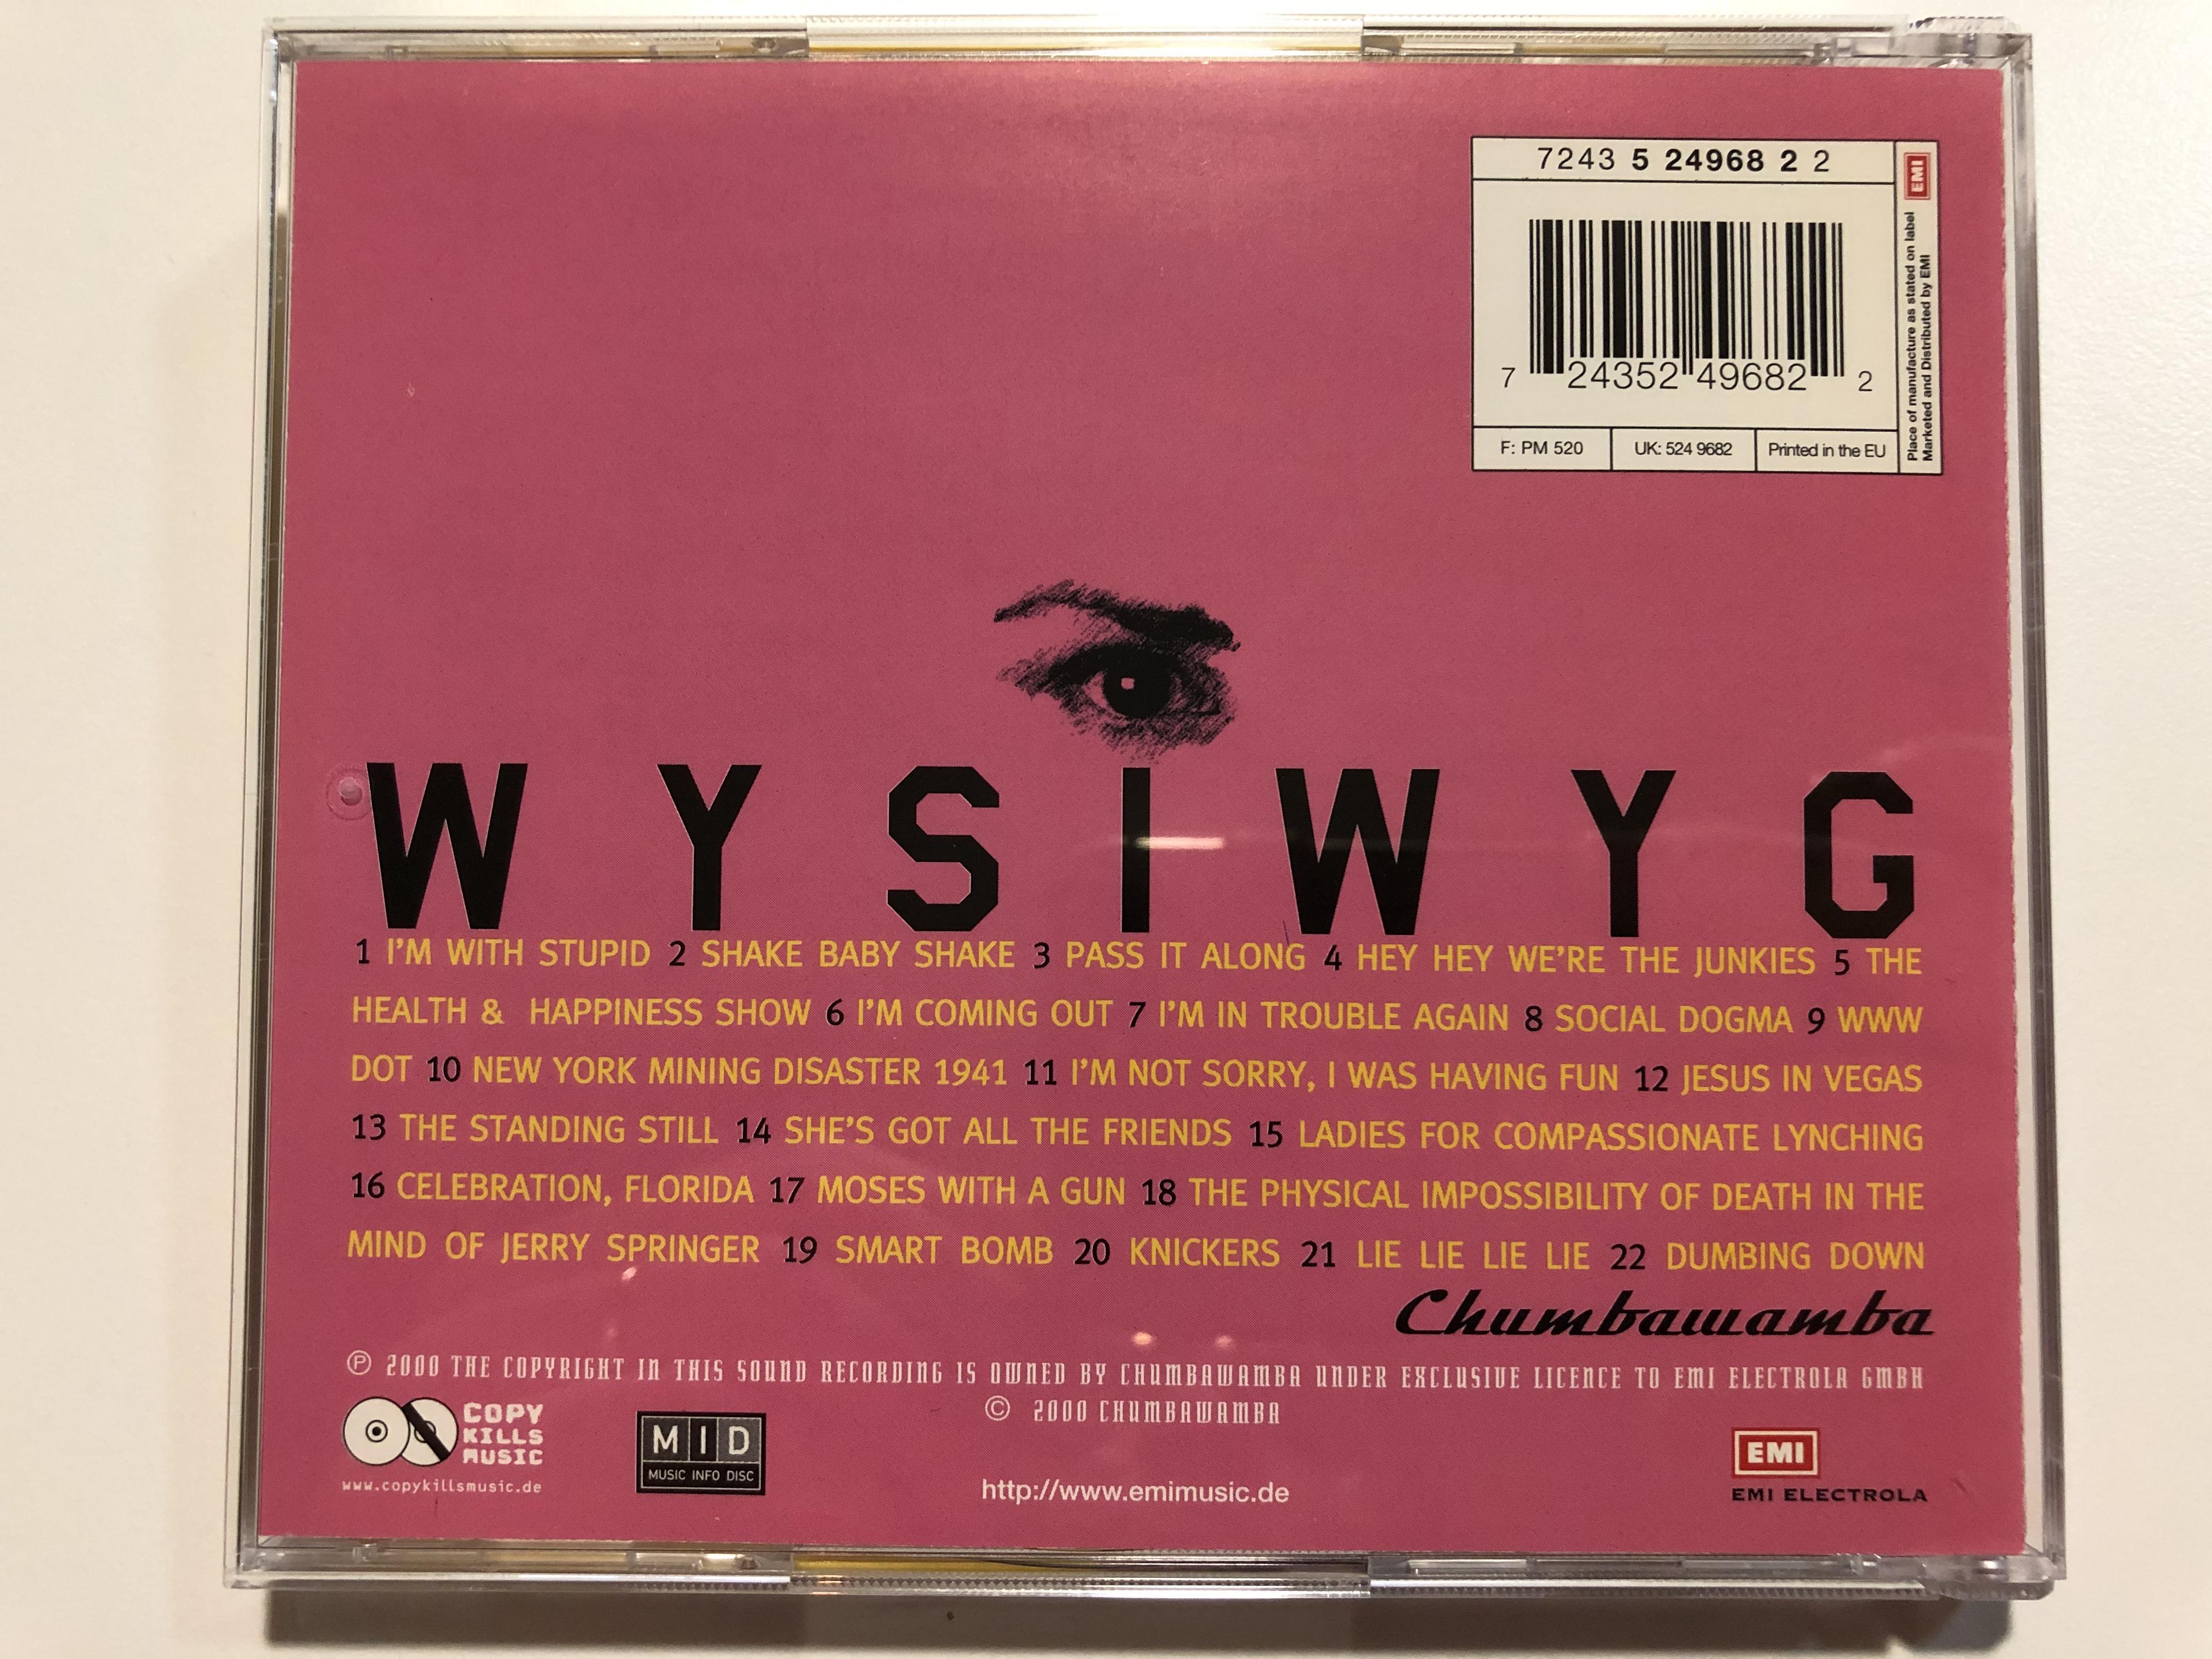 chumbawamba-wysiwyg-emi-electrola-audio-cd-2000-724352496822-2-.jpg